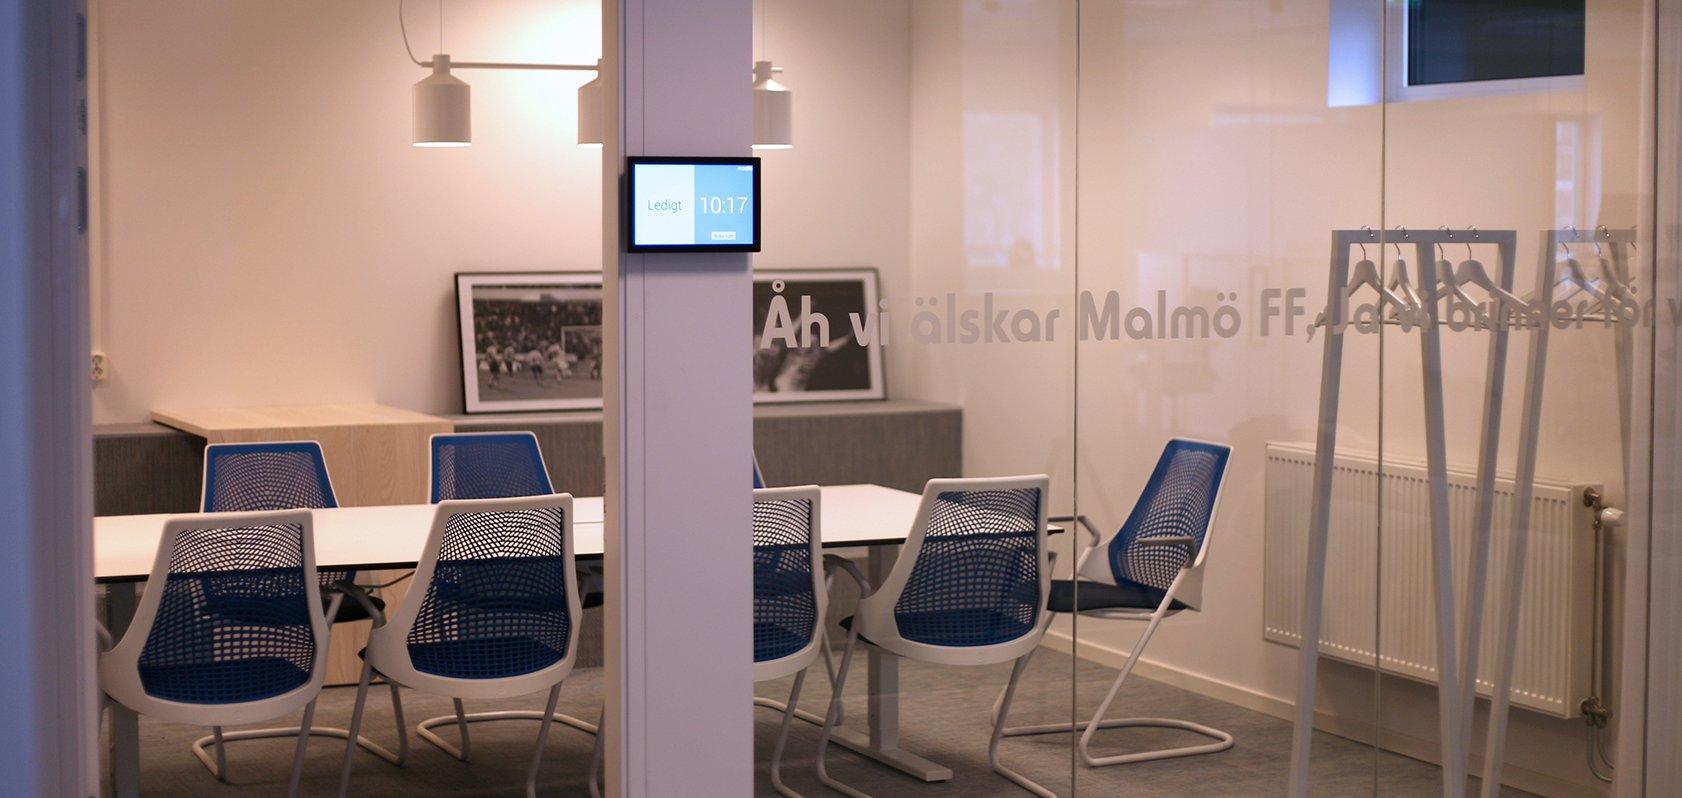 Malmö FF brandar sina konferensrum